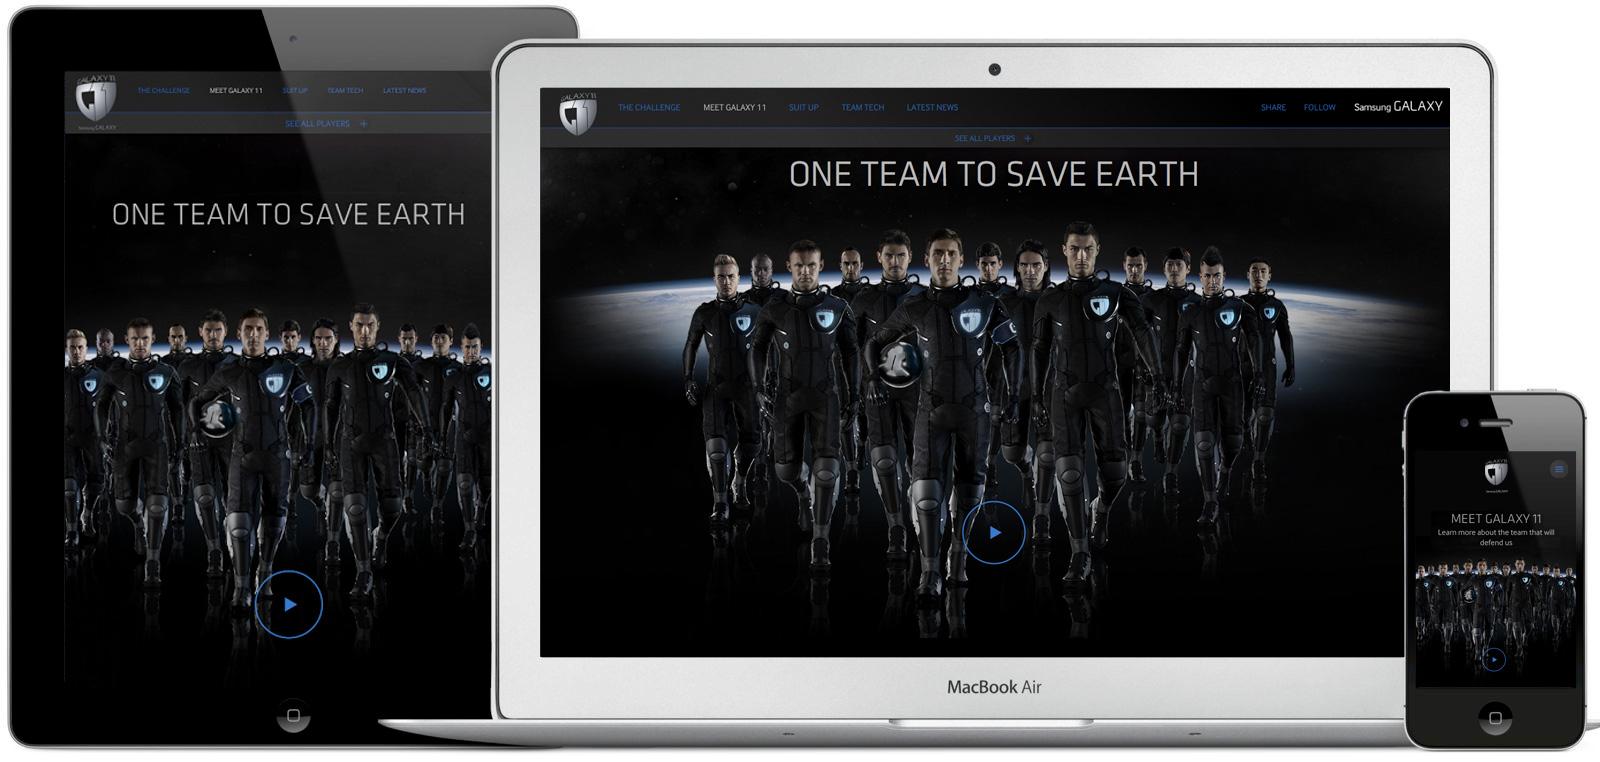 iPad_MacbookAir_iPhone4.jpg